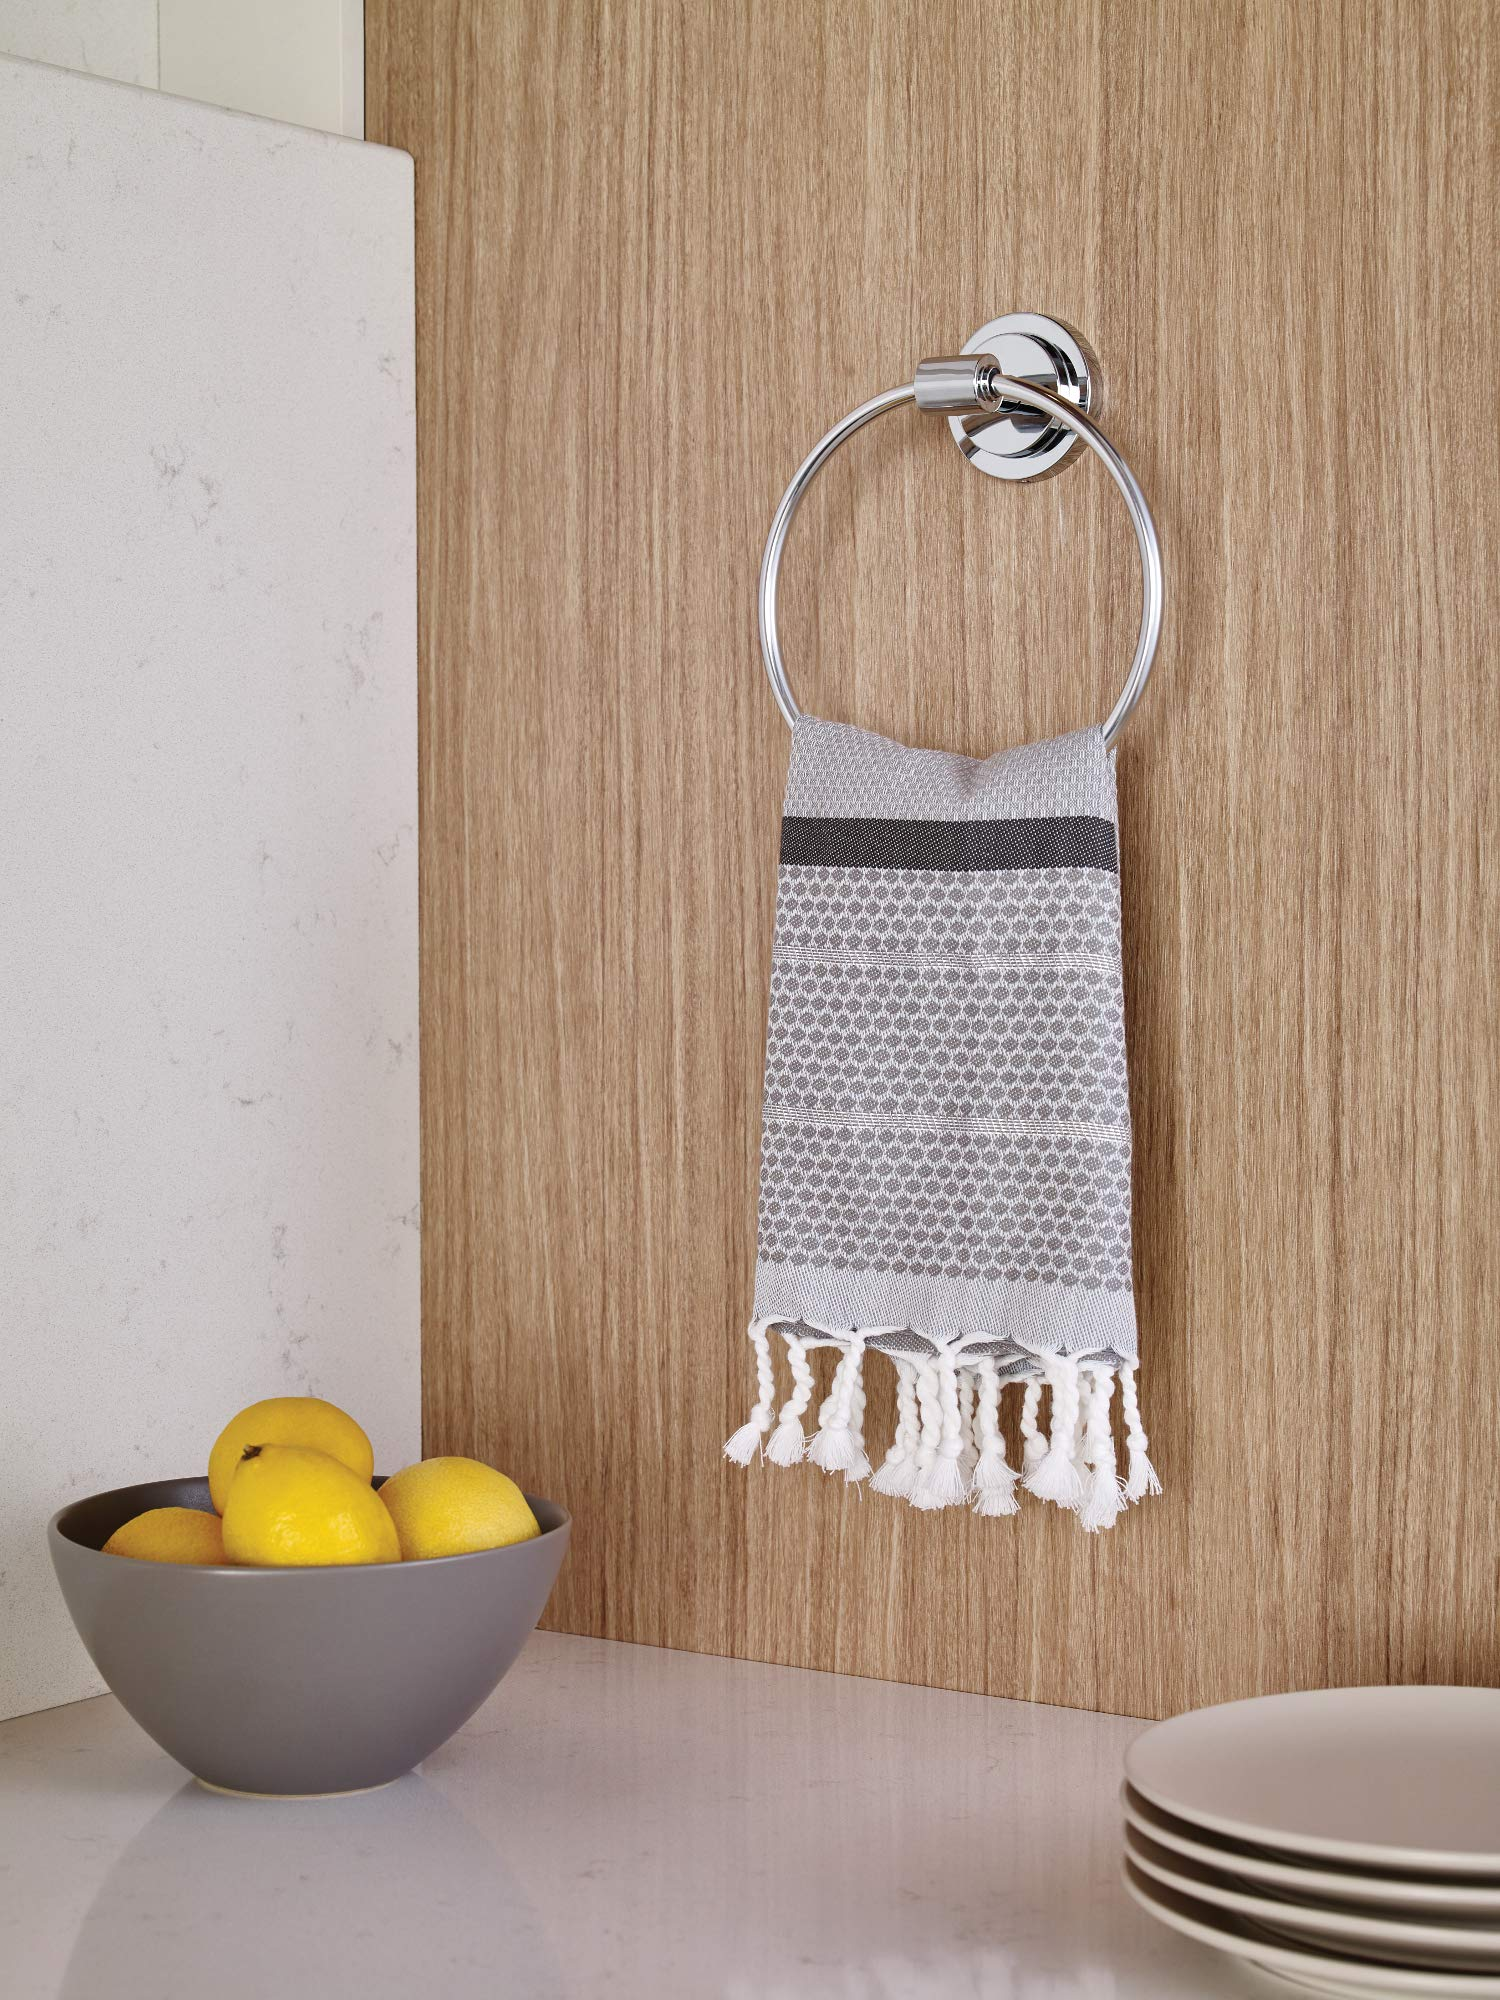 Moen DN0786CH Iso Bathroom Hand Towel Ring, Chrome by Moen